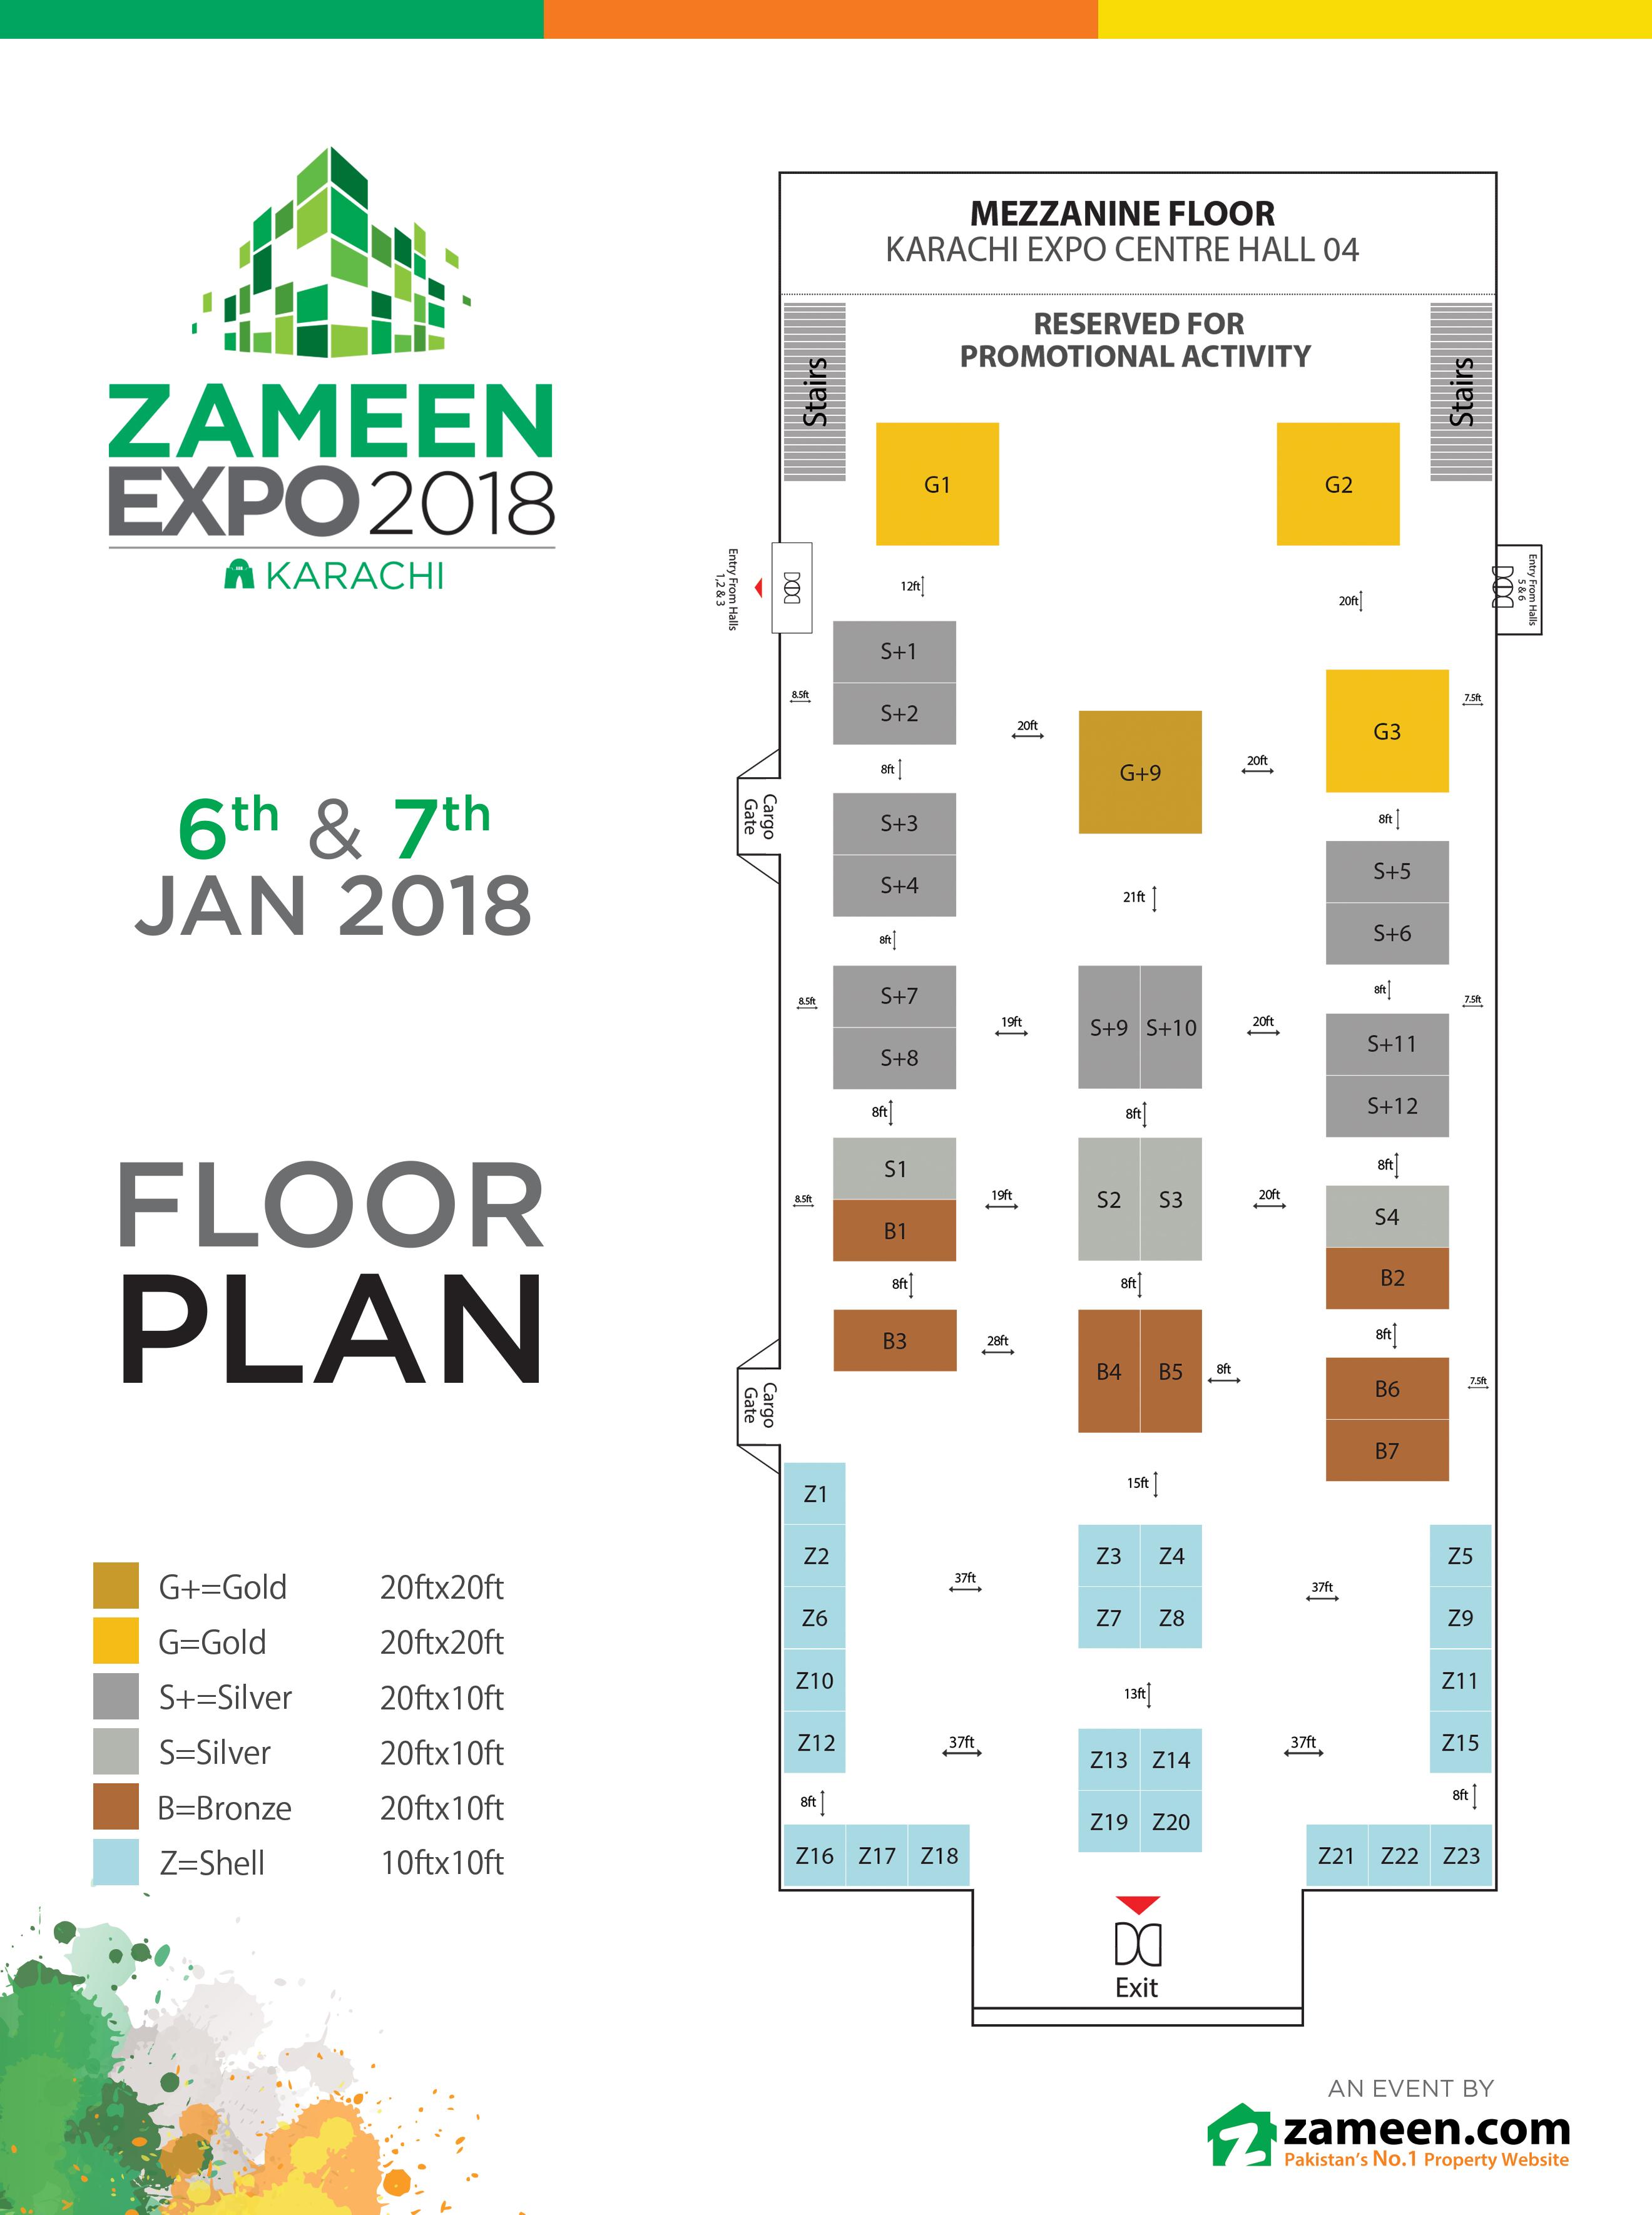 floorplan-karachi-2018-img1